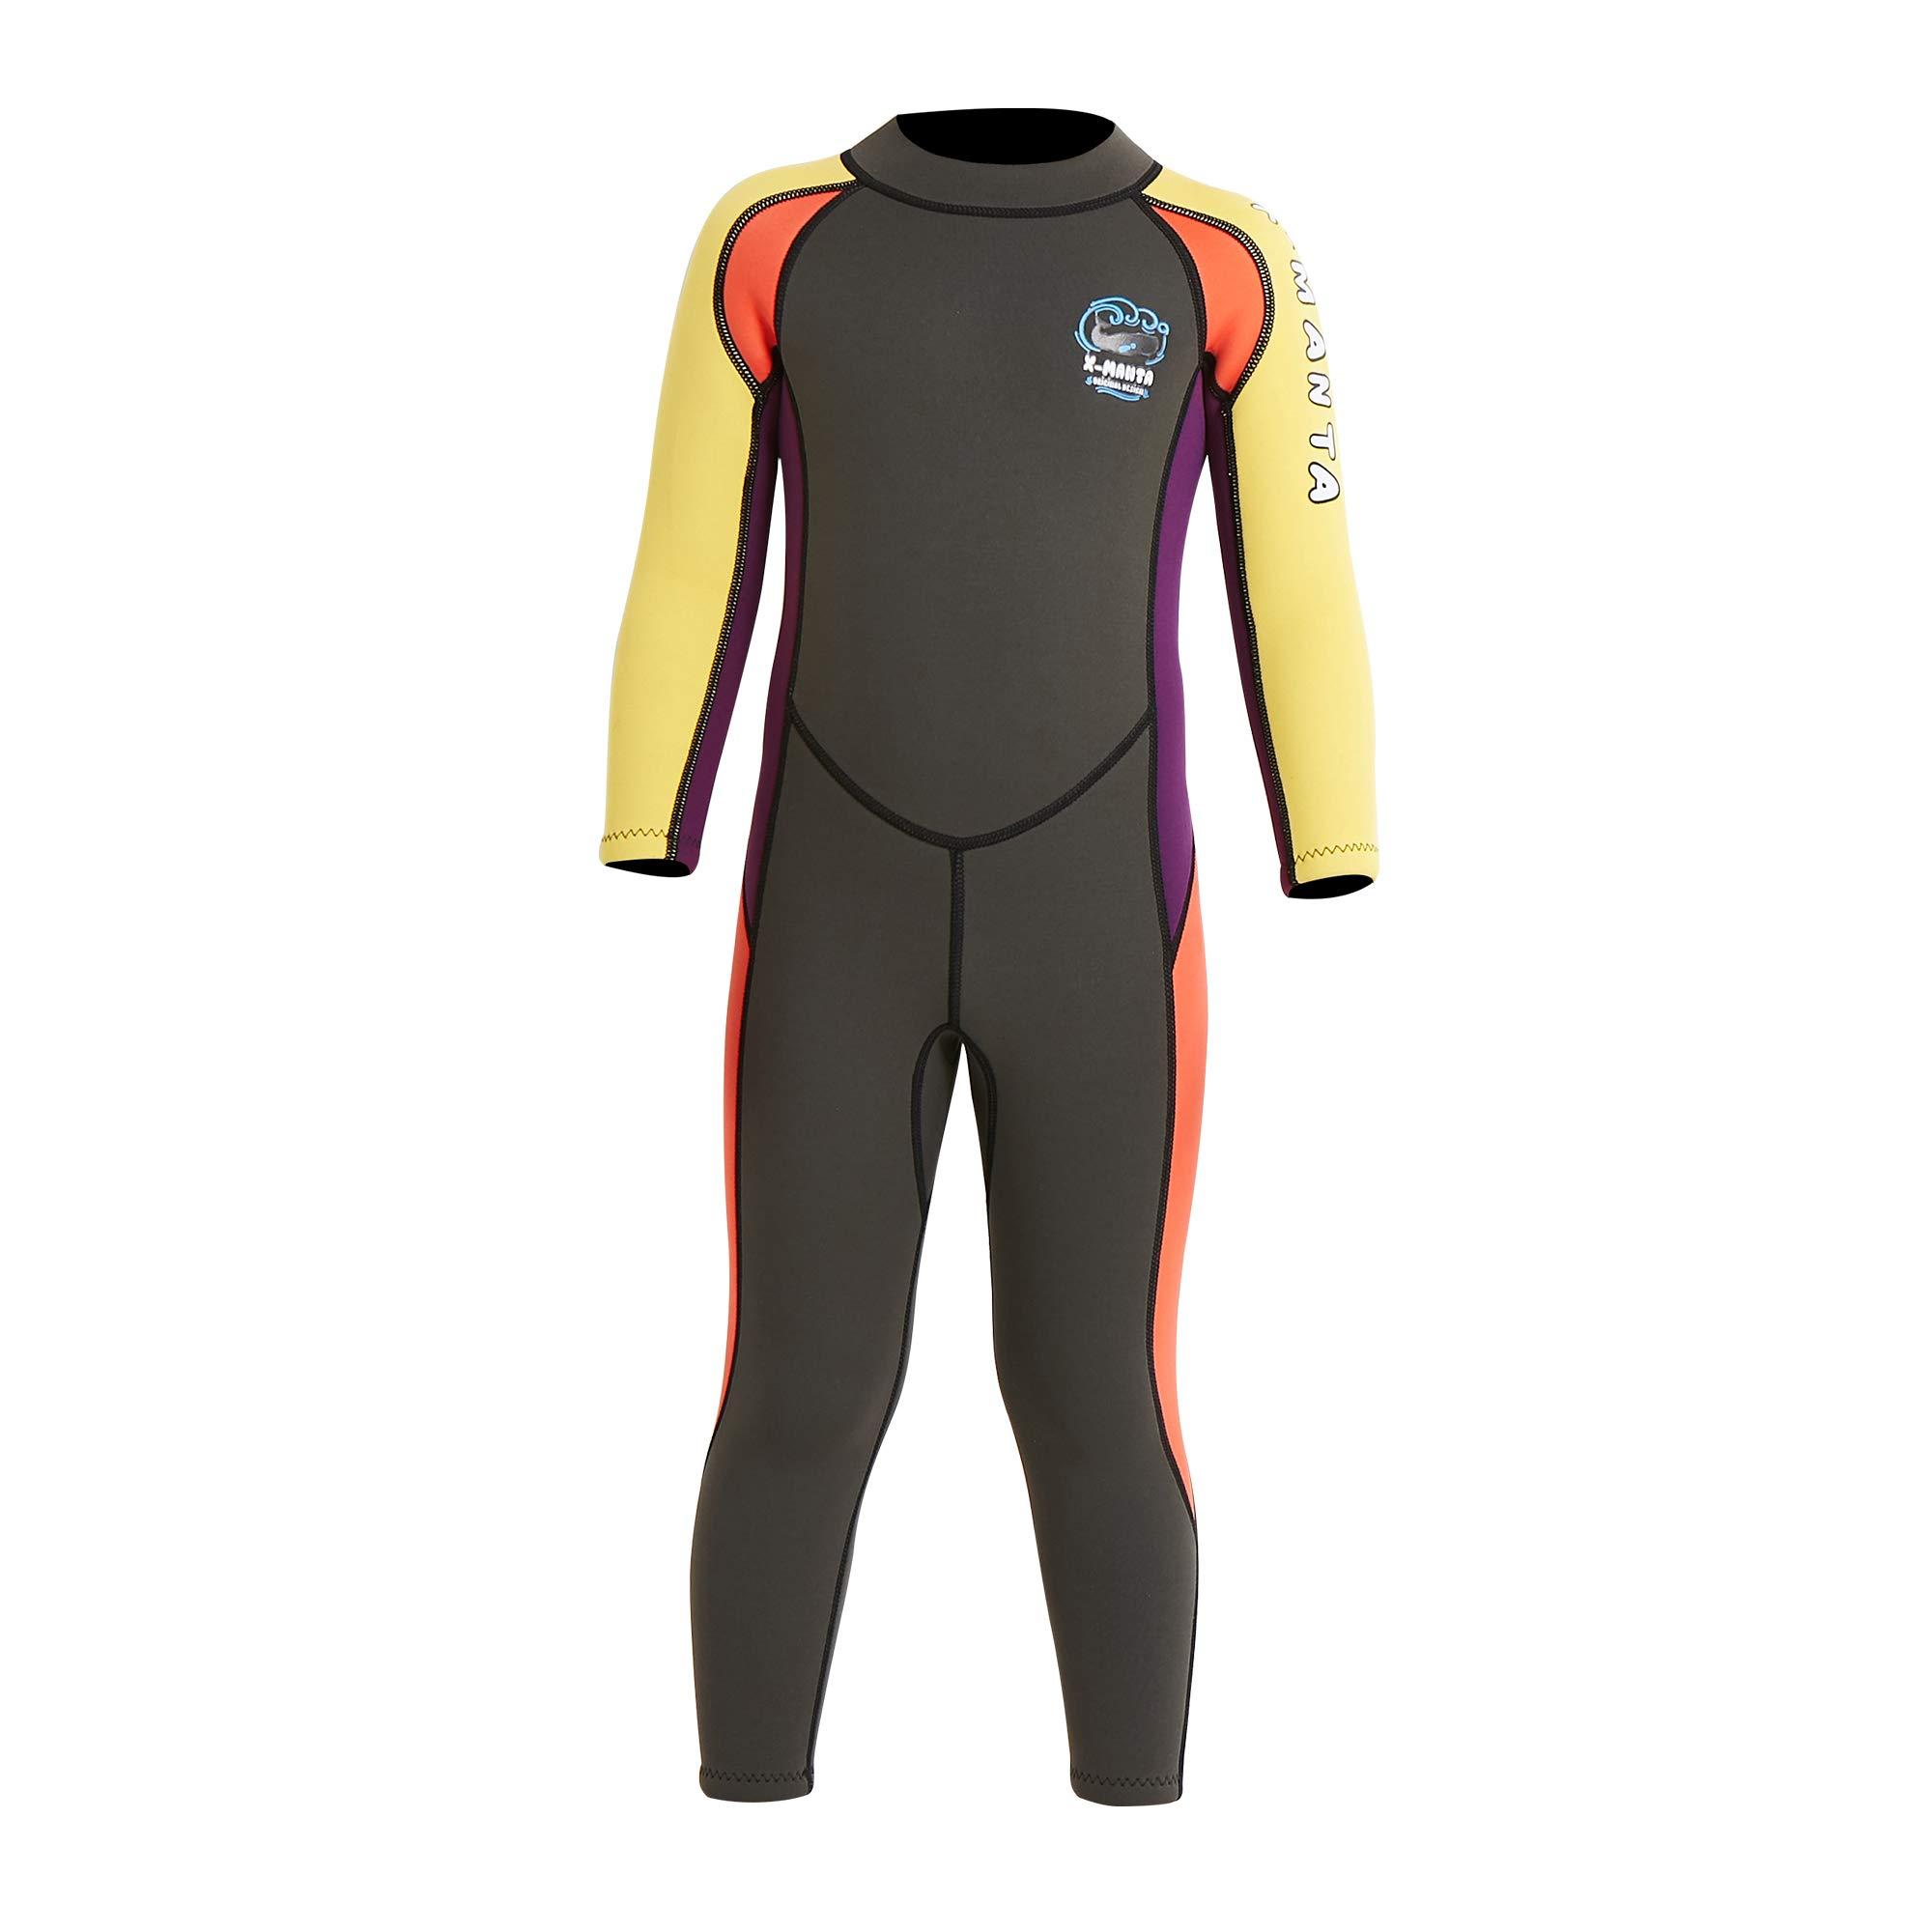 dark lightning Kids Wetsuit Full Thermal Suit, Boys Neoprene One Piece Fishing Suits, 2mm Long Sleeve Swimsuit for Children Scuba Diving, Surfing, Paddling, Swimming, Grey,S Size by dark lightning